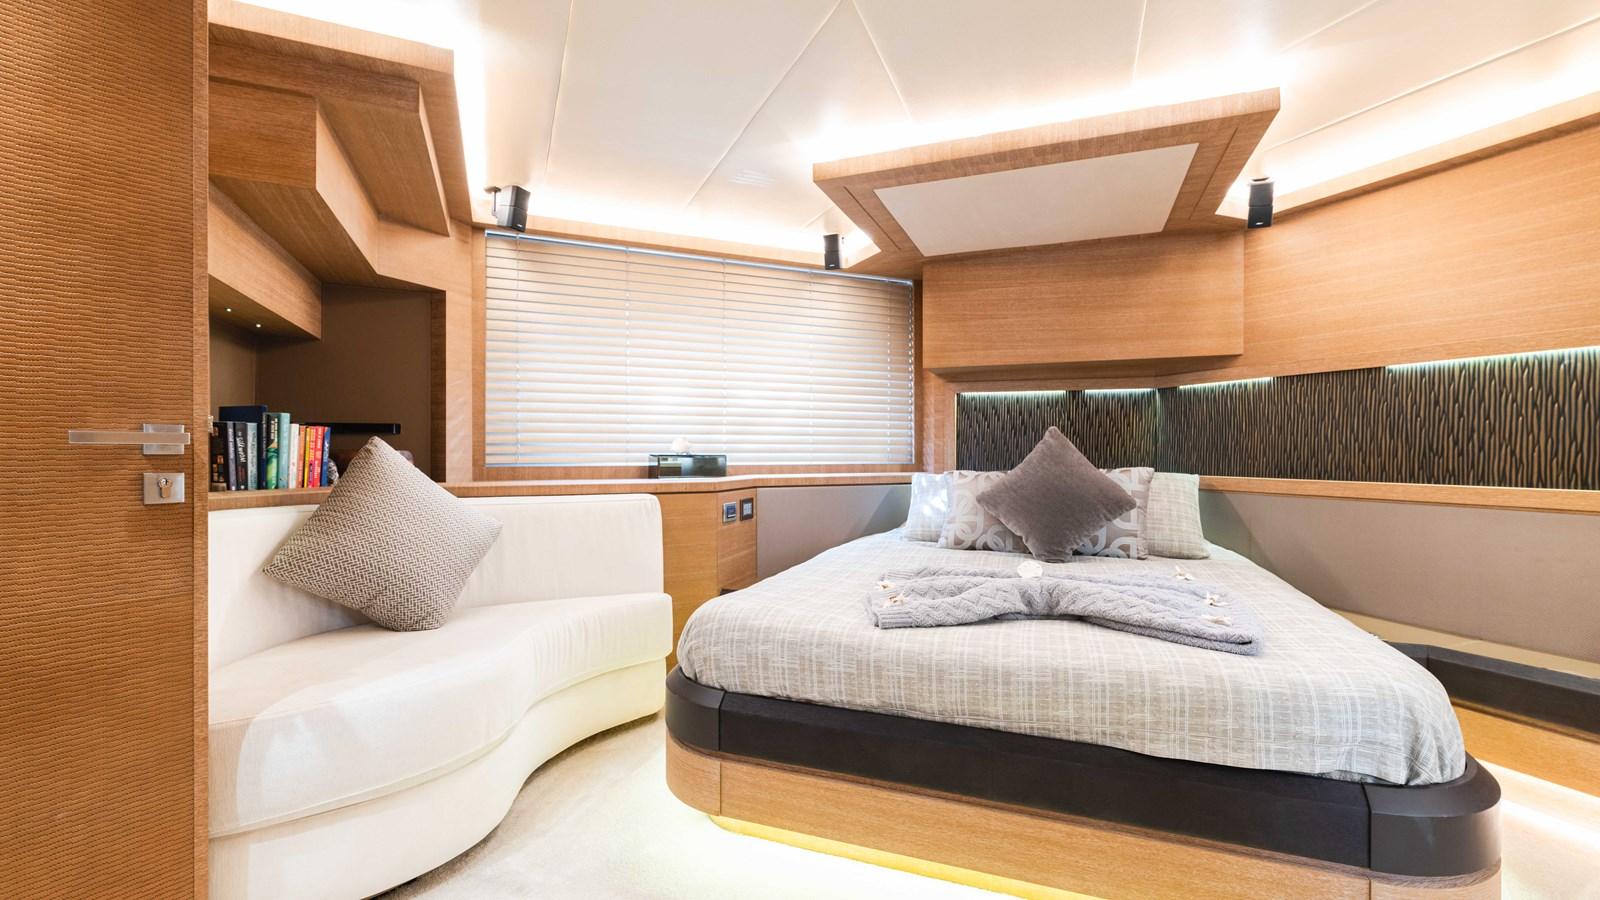 76 Monte Carlo (30 of 127) 2014 MONTE CARLO YACHTS Motoryacht Motor Yacht 2825179